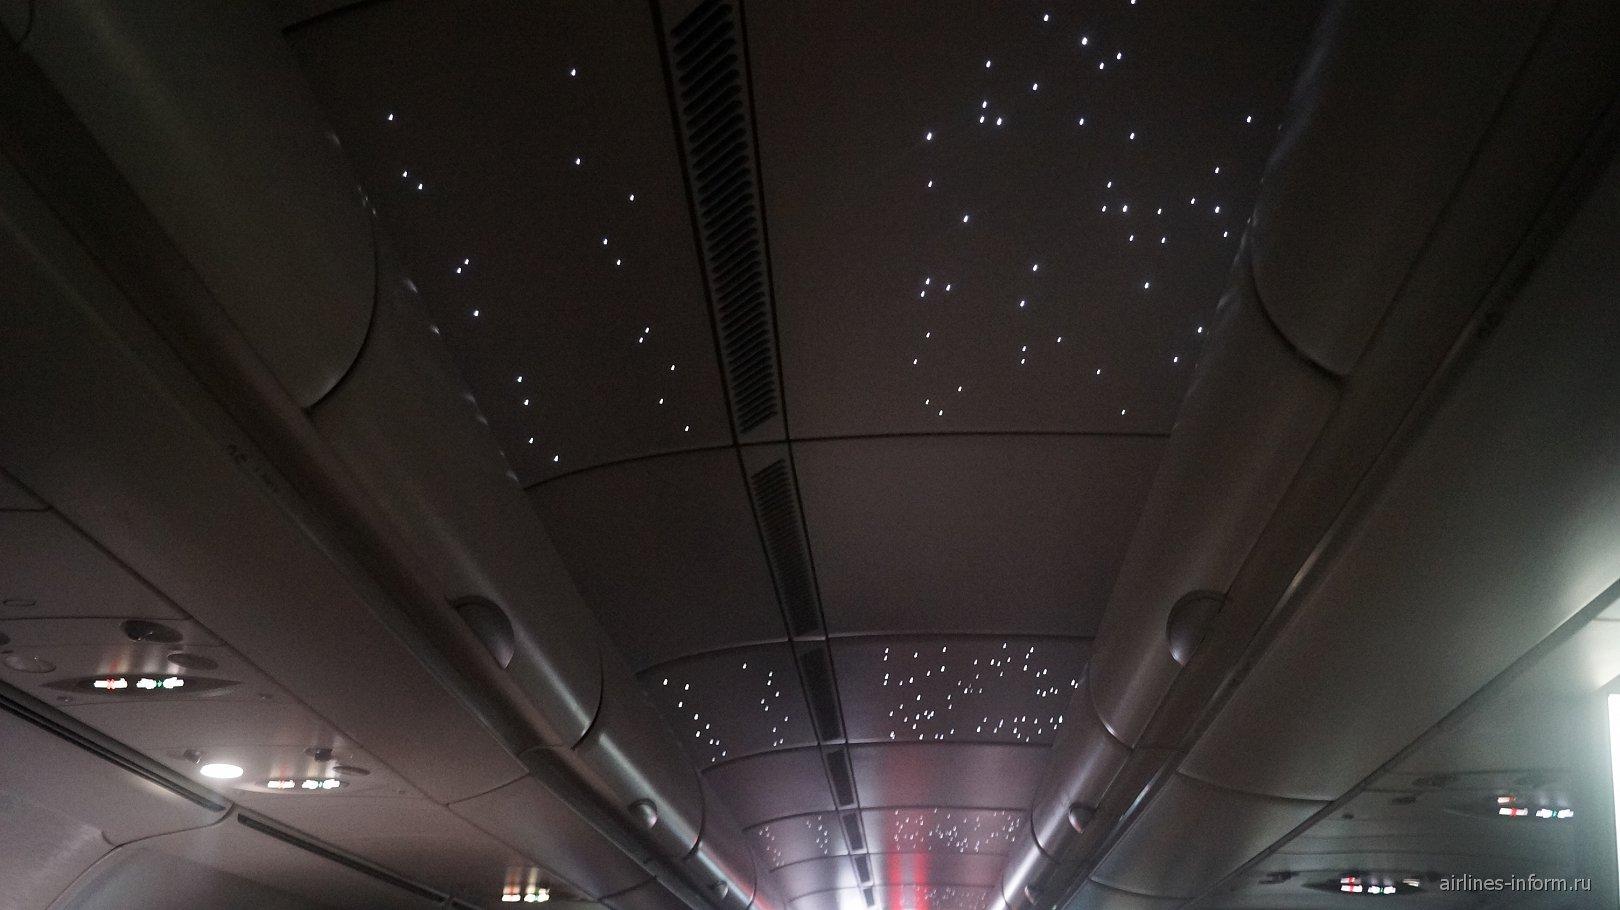 """Звездное небо"" на потолке самолета Airbus A340-500 авиакомпании Emirates"